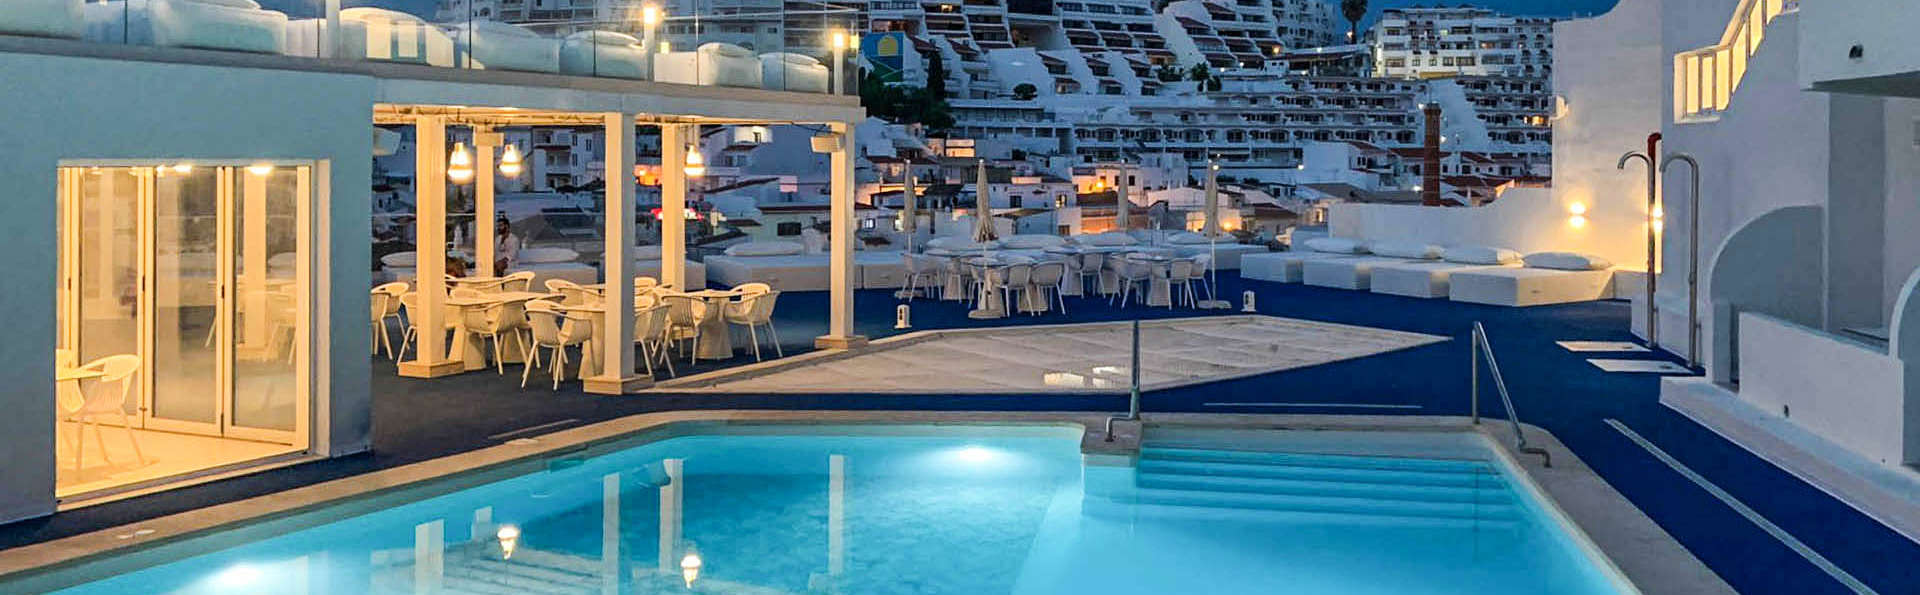 Califórnia Urban Beach Hotel - EDIT_Pool_Area_06.jpg